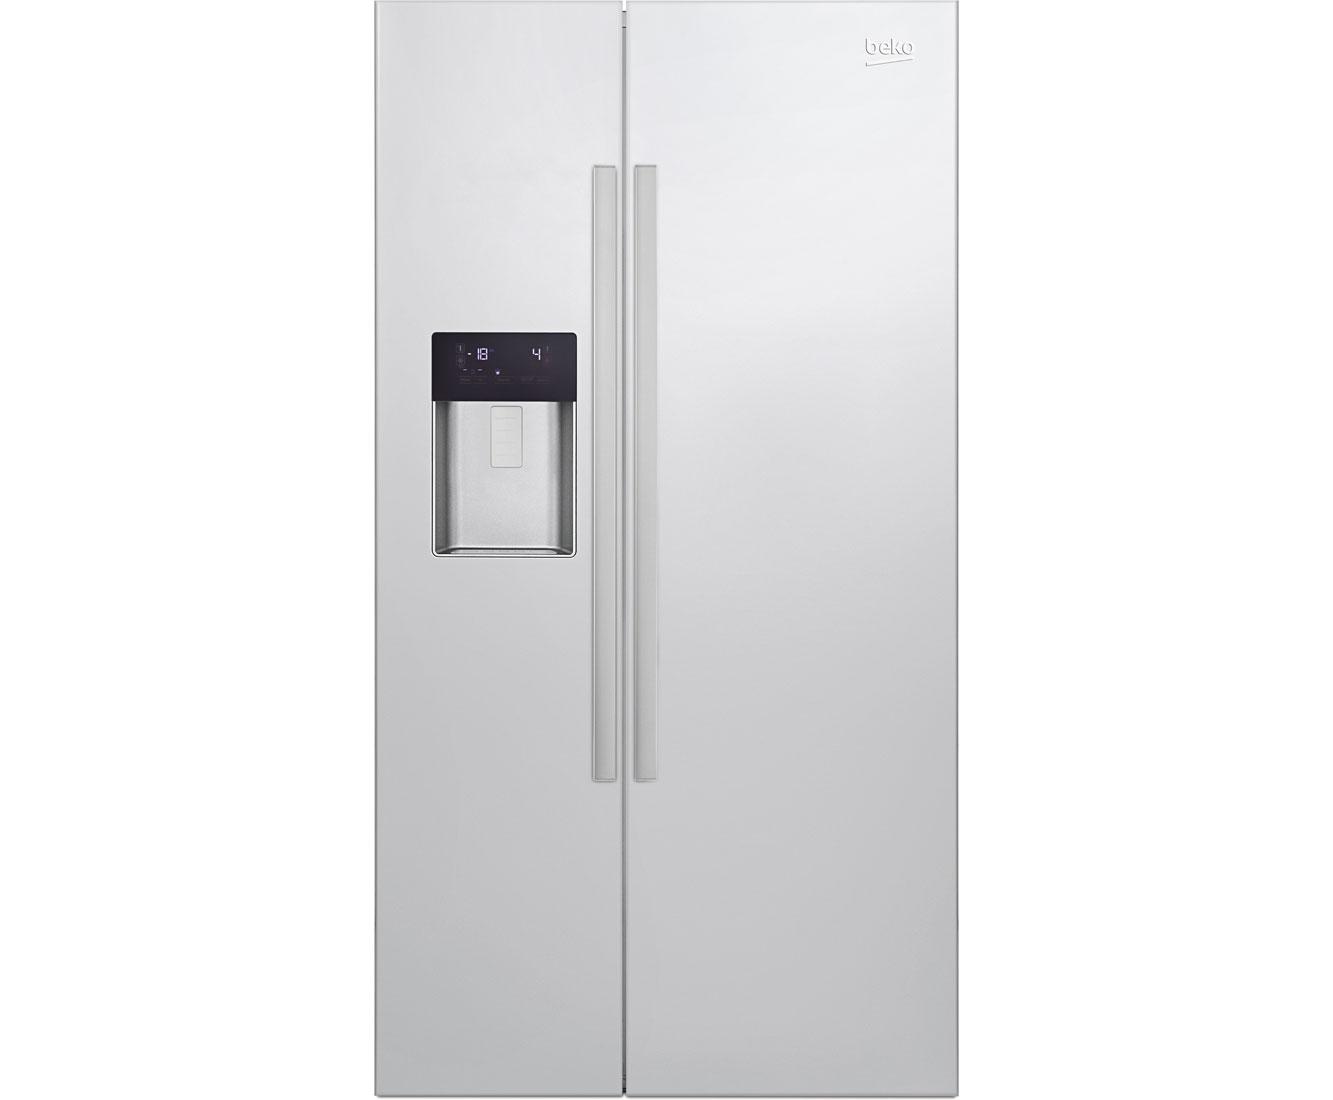 Side By Side Kühlschrank Wasseranschluss Verlängern : Rs ugdsr ef ggh side by side space max cm ℓ